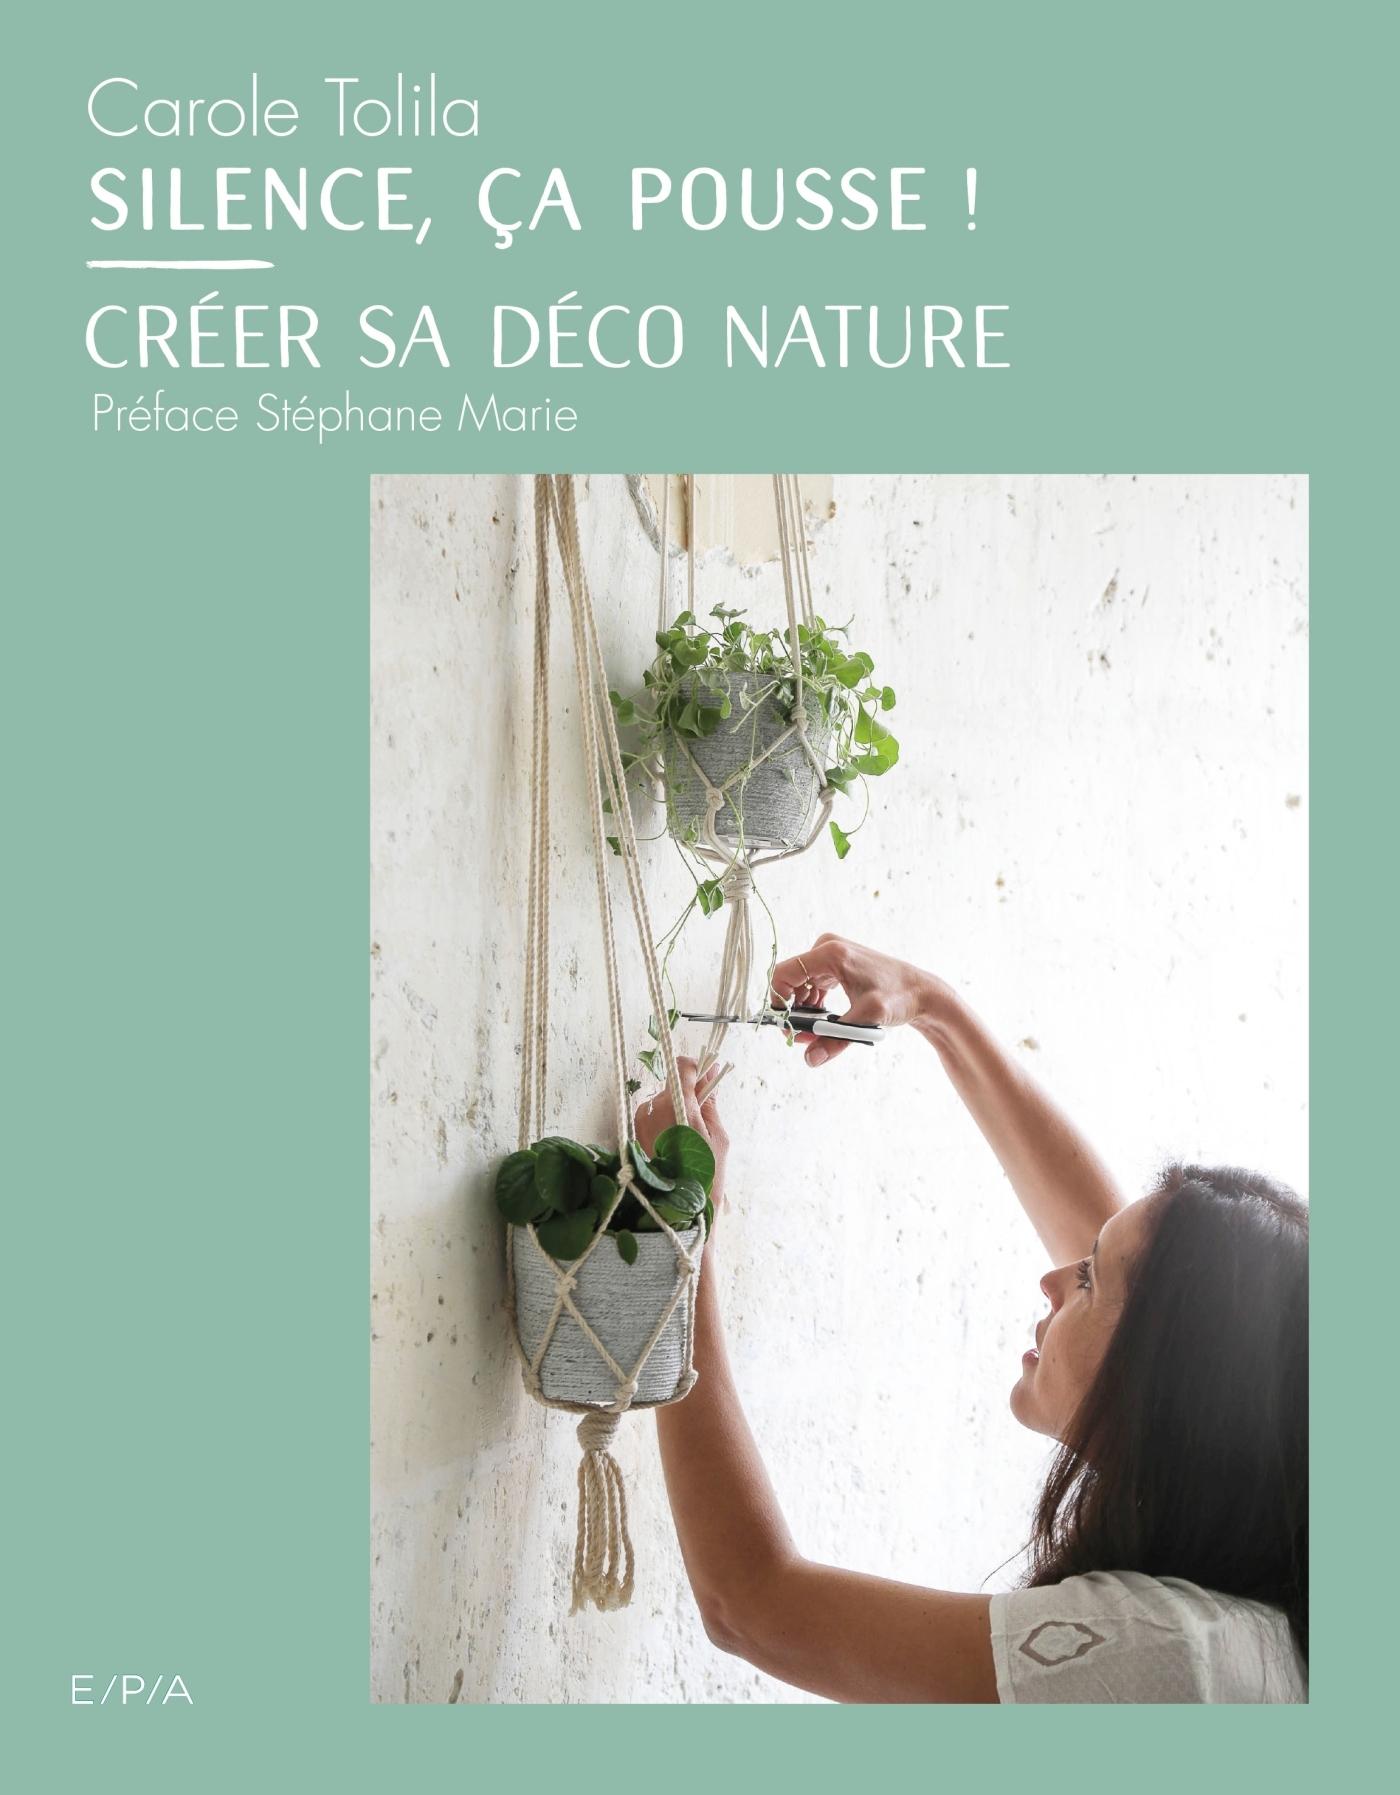 SILENCE CA POUSSE ! - CREER SA DECO NATURE